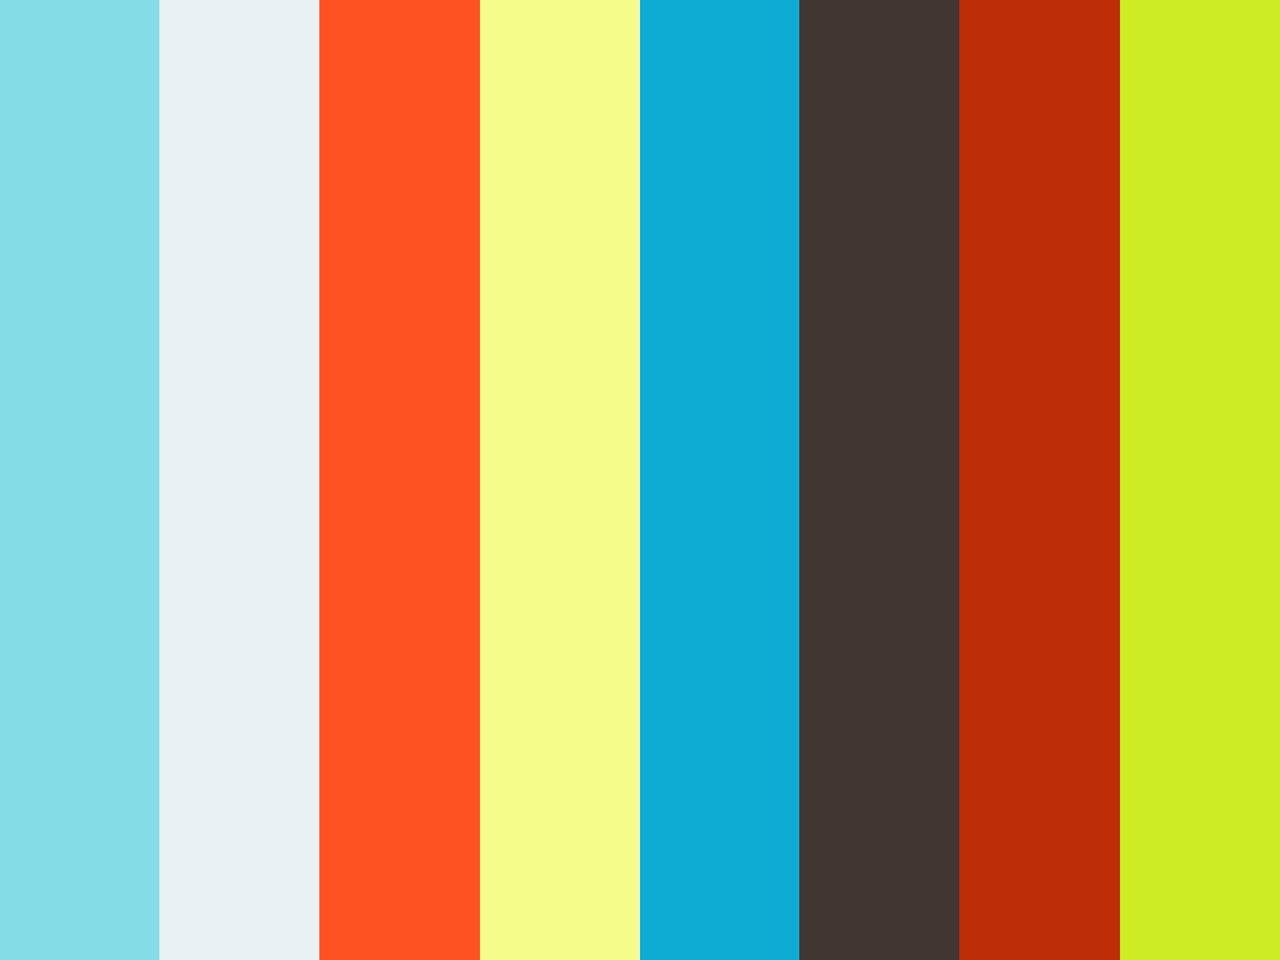 Webstock '14: Paula Scher - All design is social